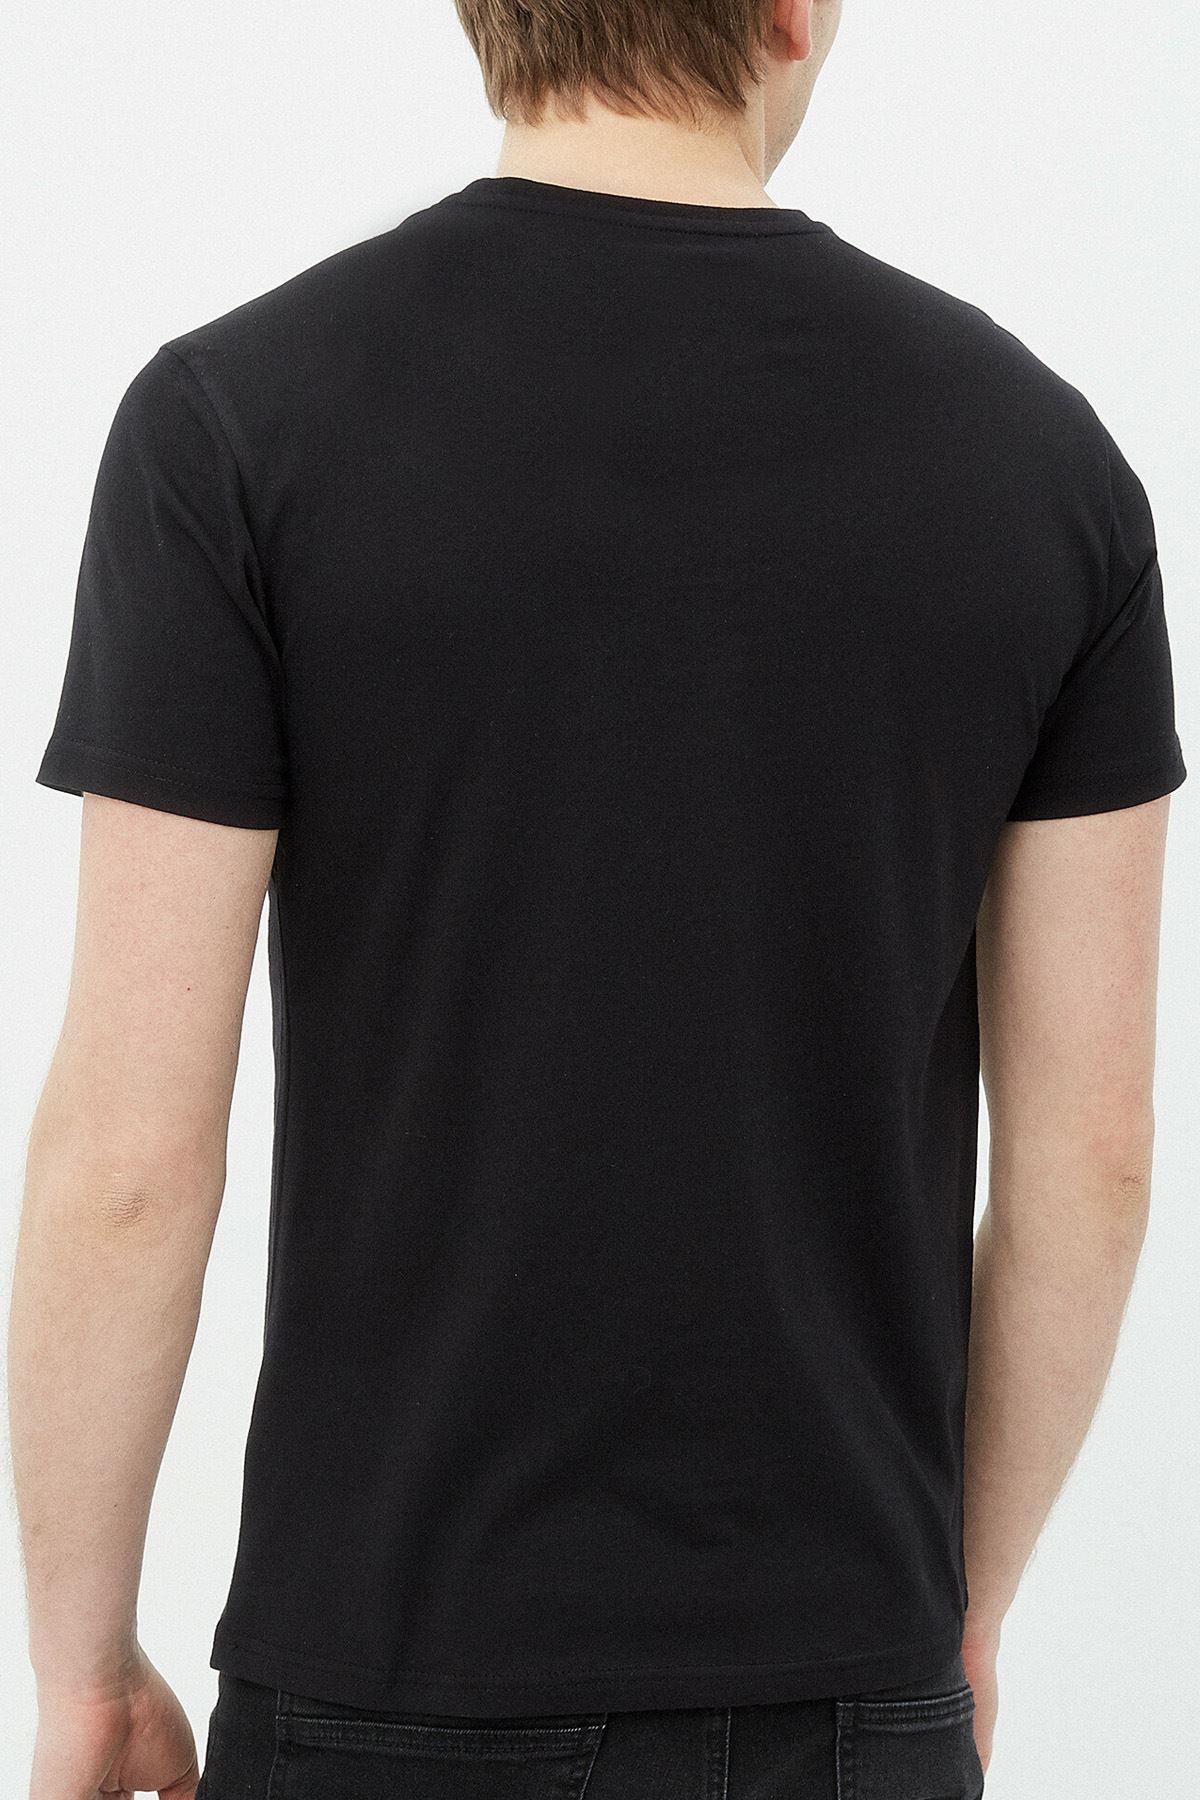 Naruto Anime 07 Siyah Erkek Tshirt - Tişört